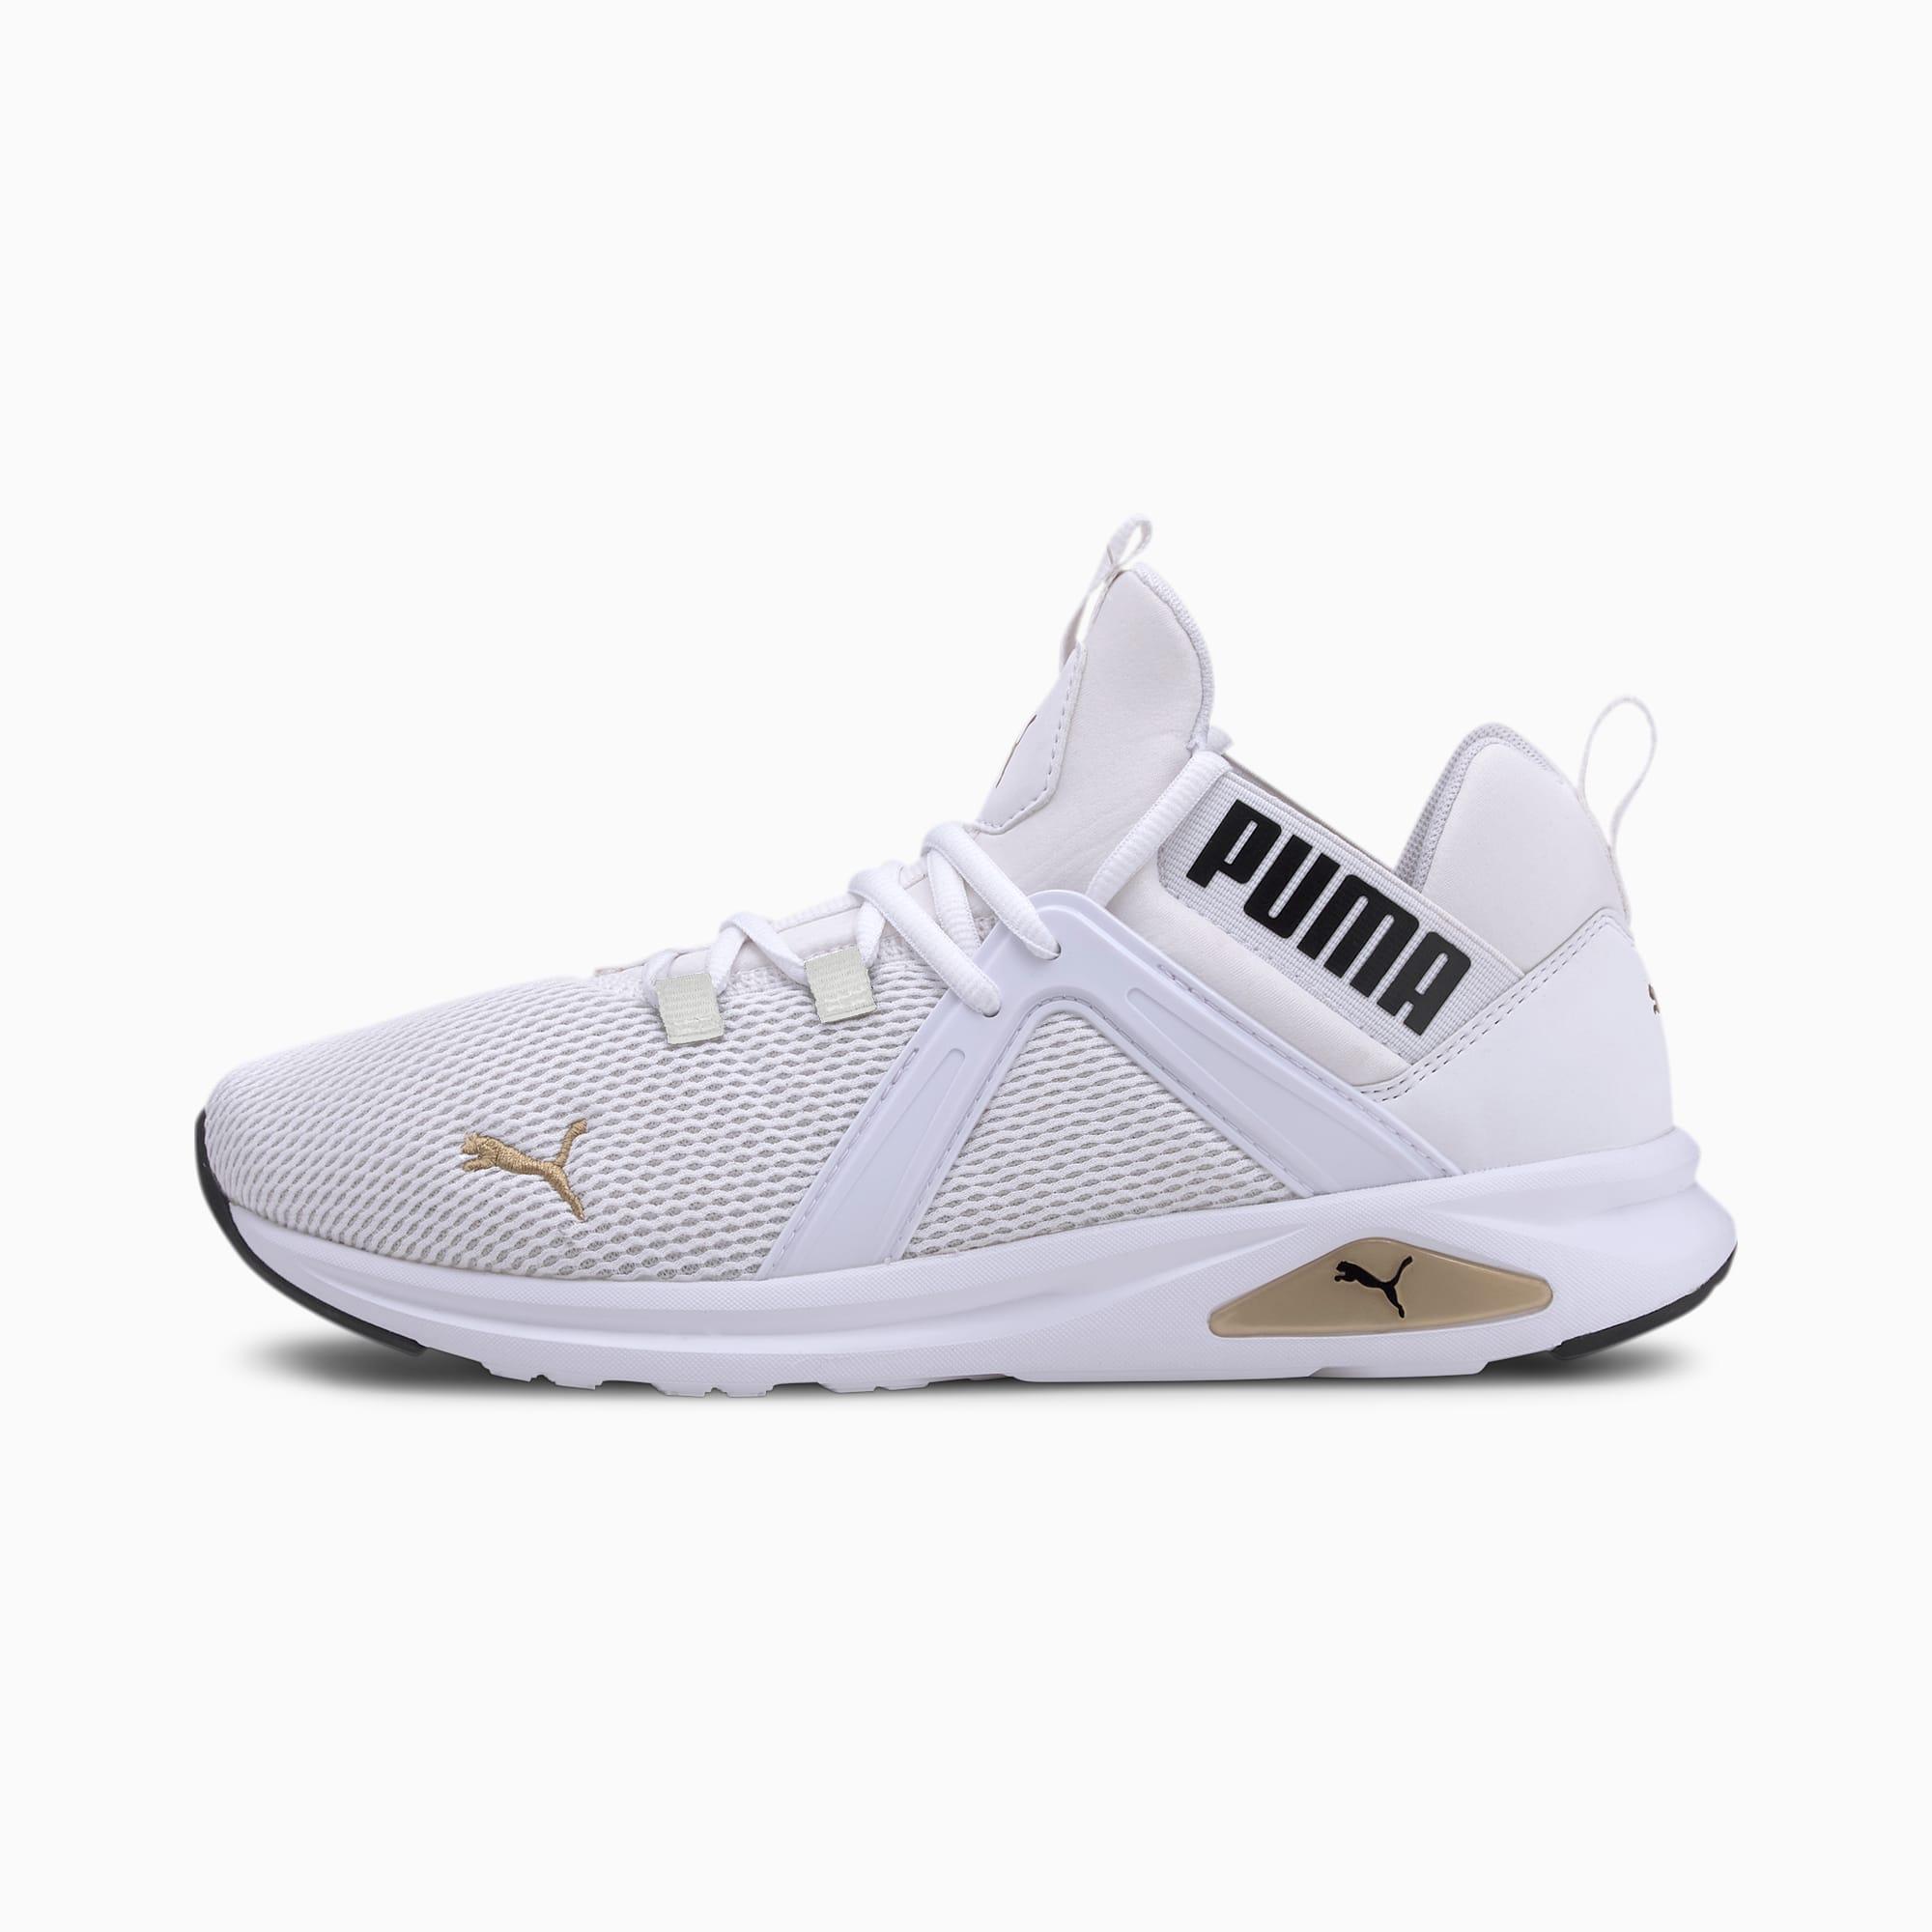 Zapatillas de running para hombre Enzo 2